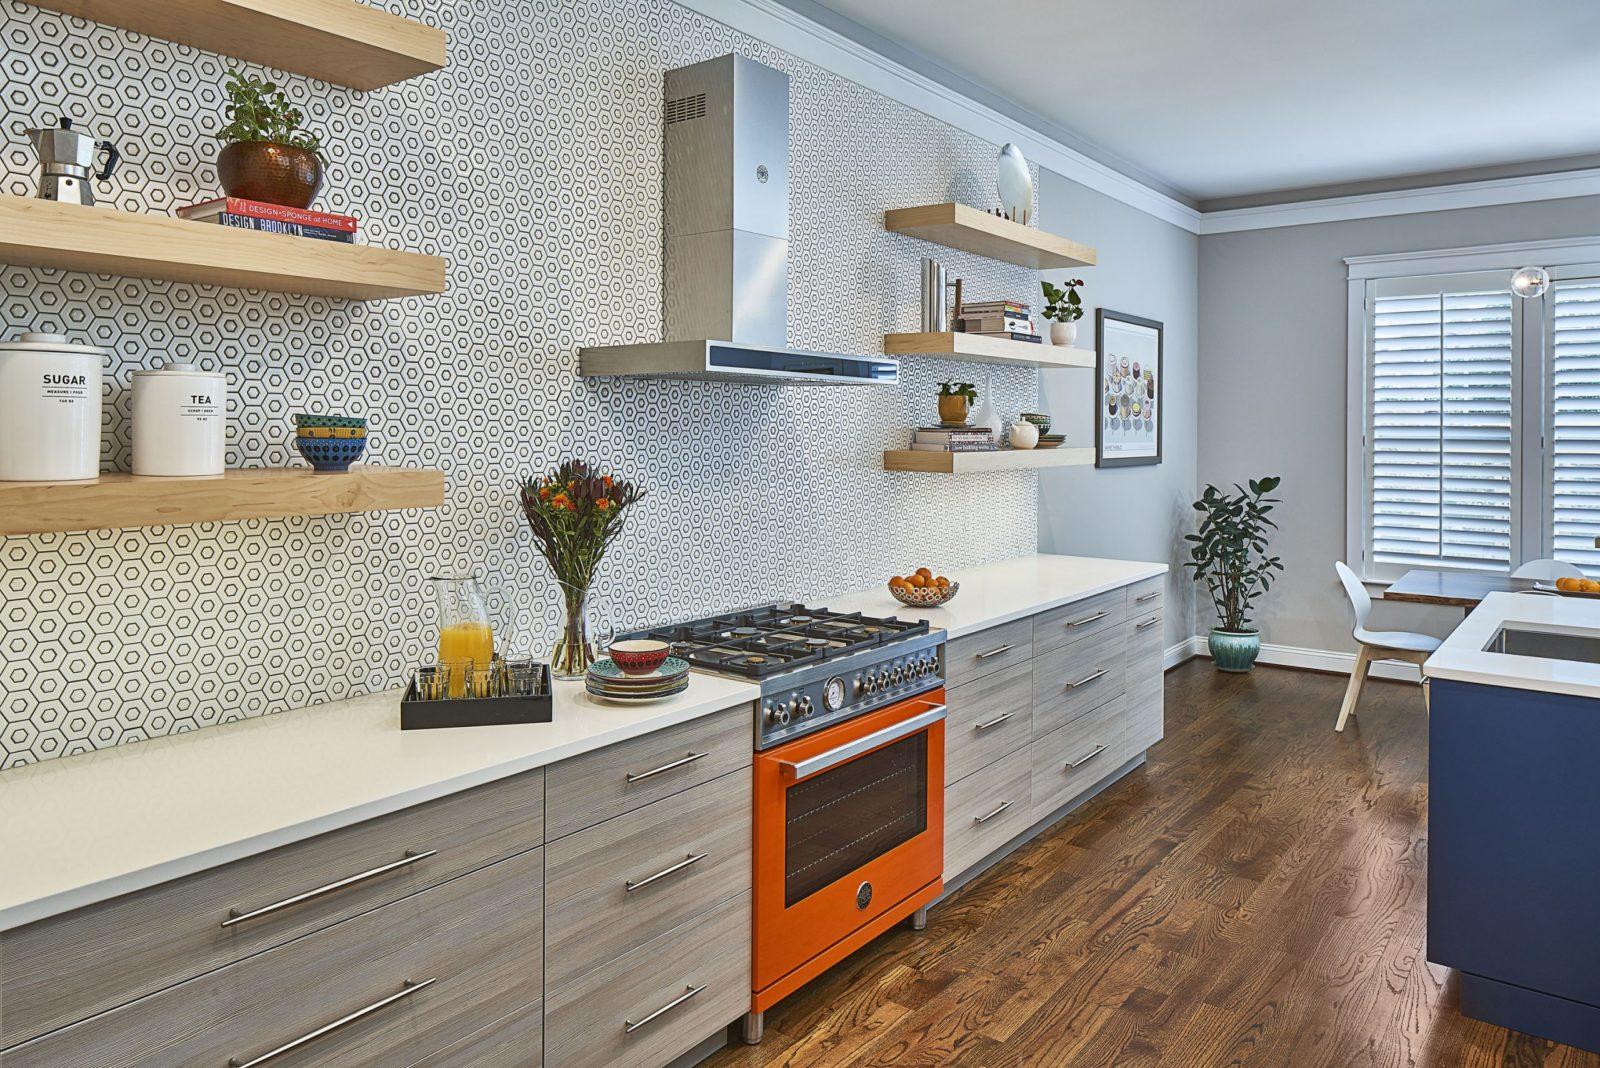 orange range in a modern kitchen with mosaic tile backsplash